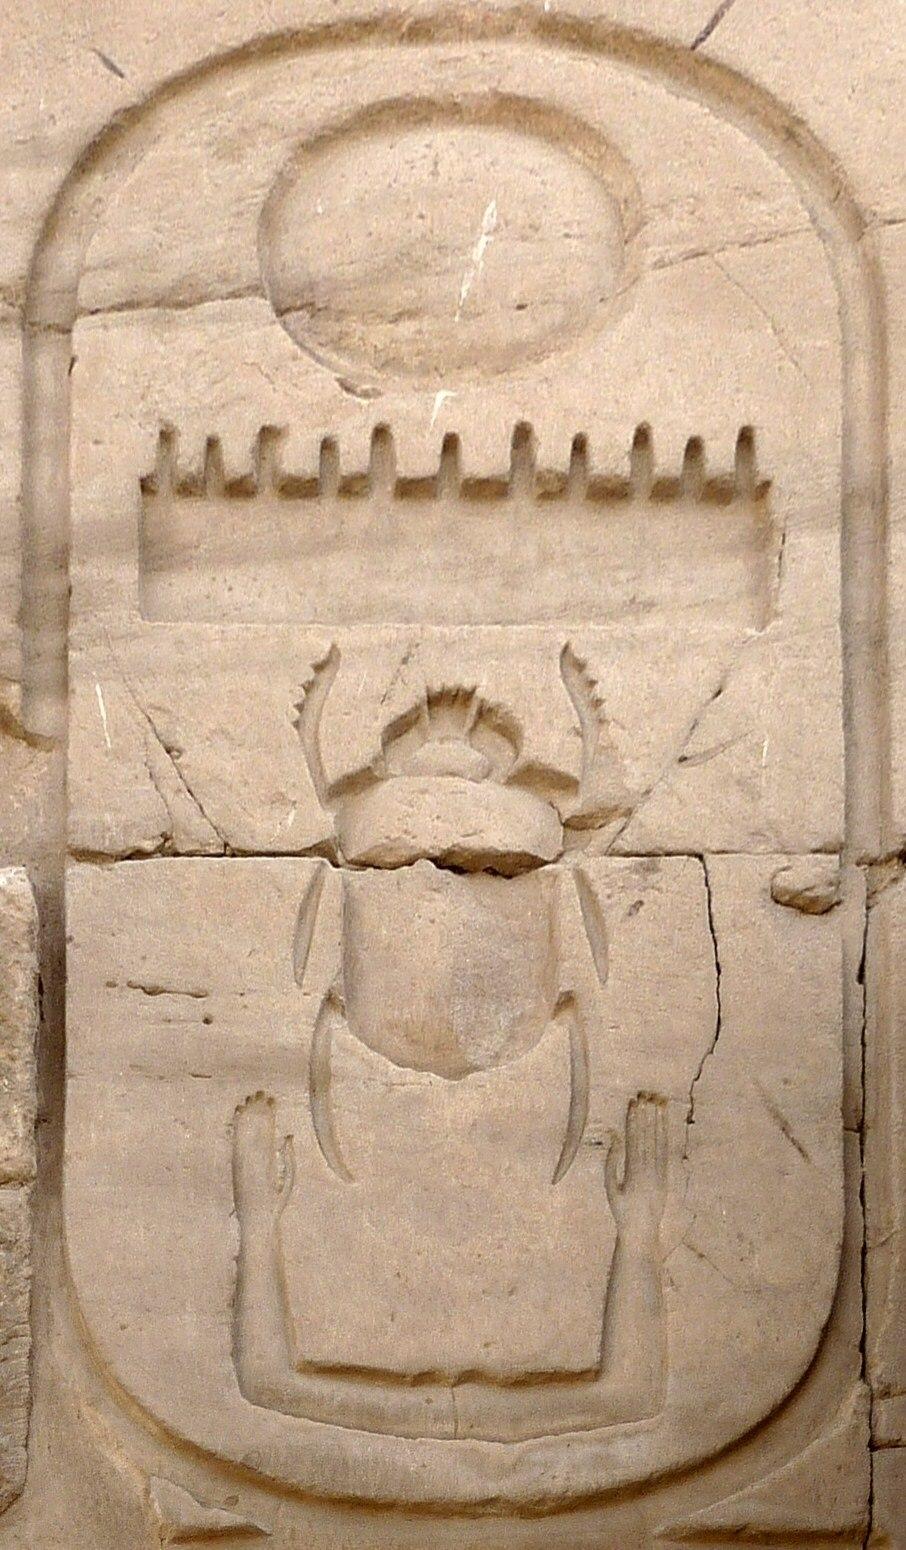 Scarab Cartouche of Thutmosis III from Karnak